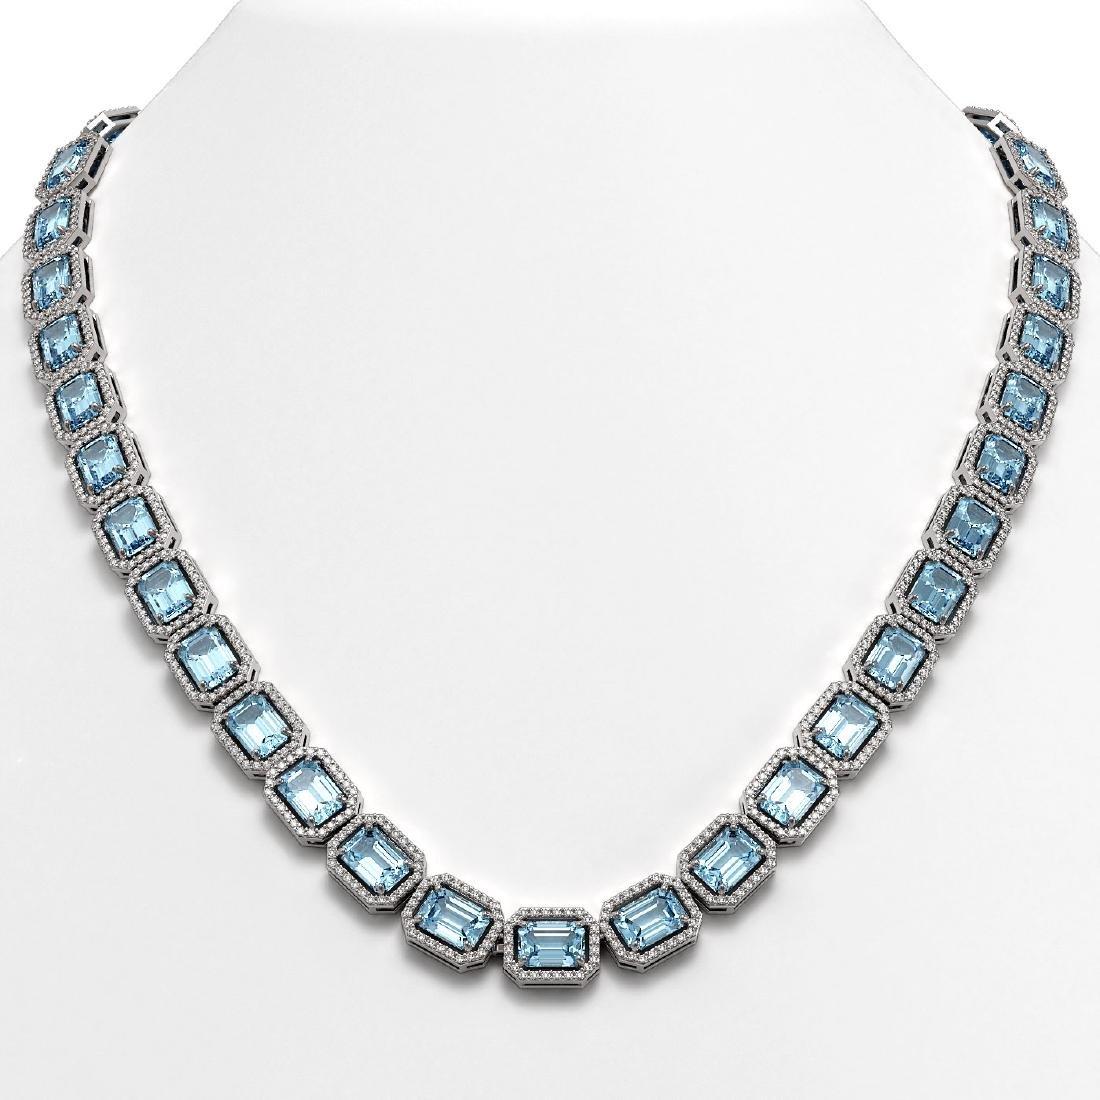 52.89 CTW Sky Topaz & Diamond Halo Necklace 10K White